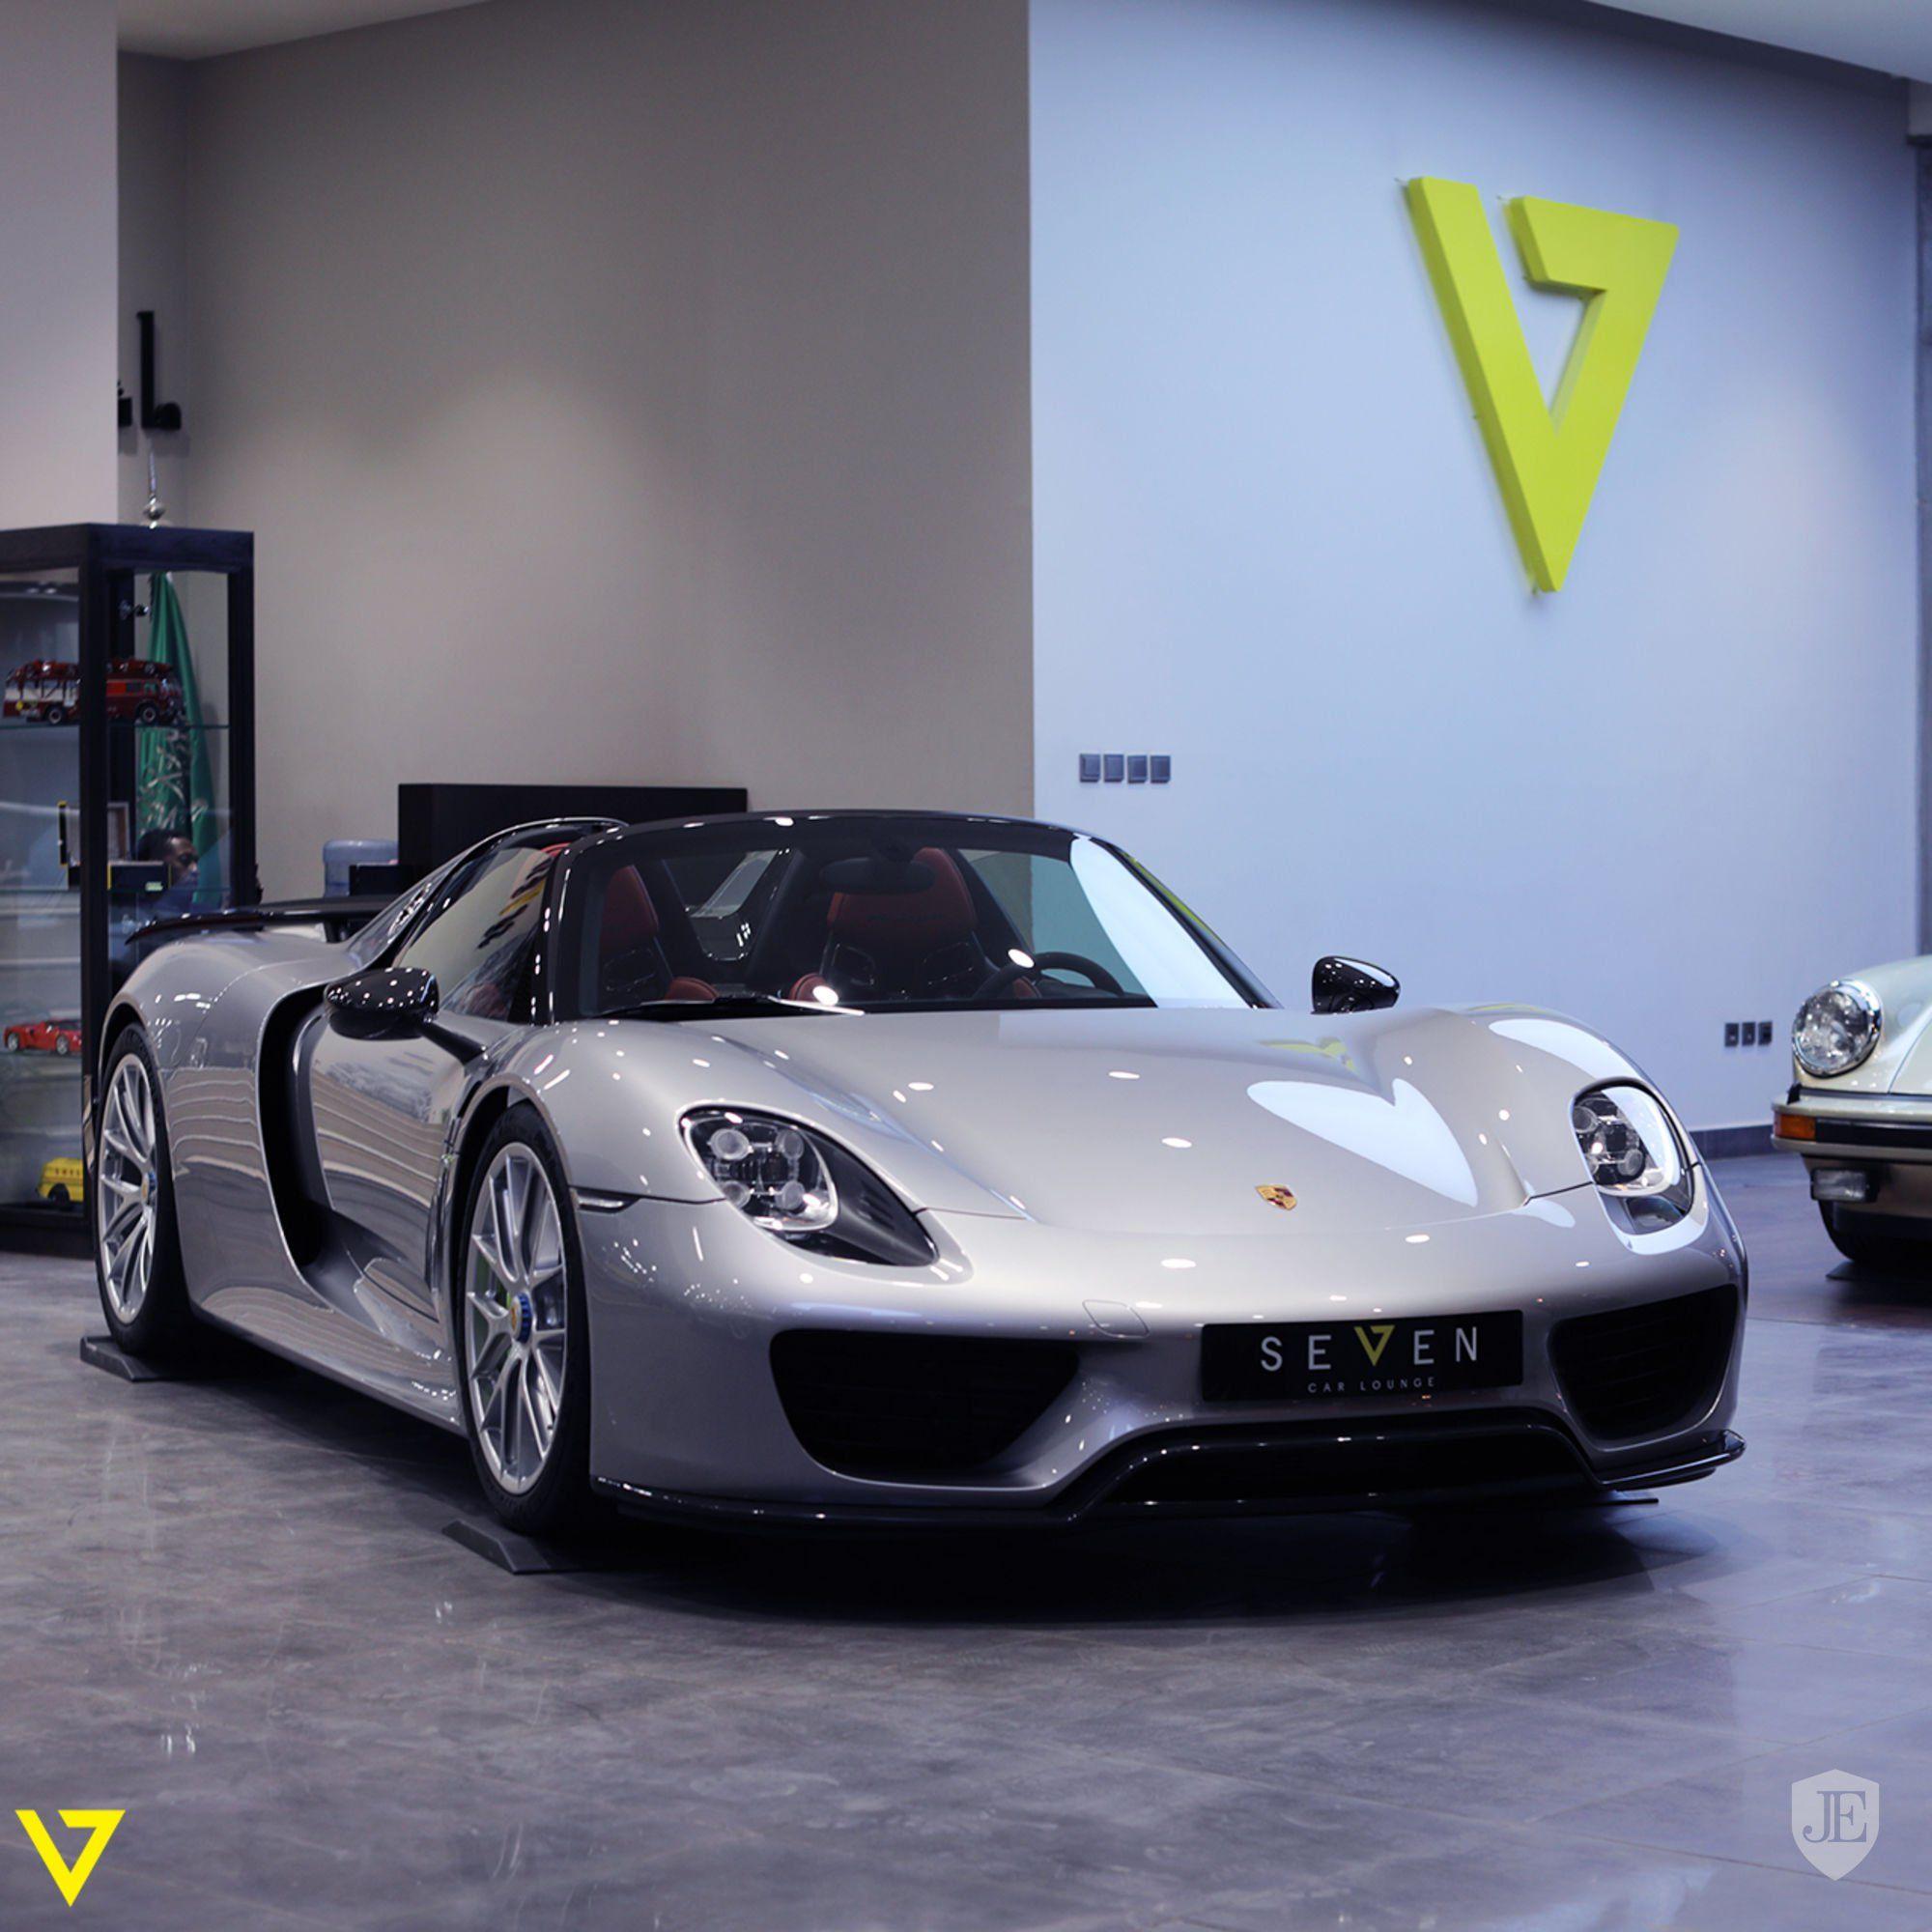 2015 Porsche 918 Spyder In Riyadh Saudi Arabia For Sale On